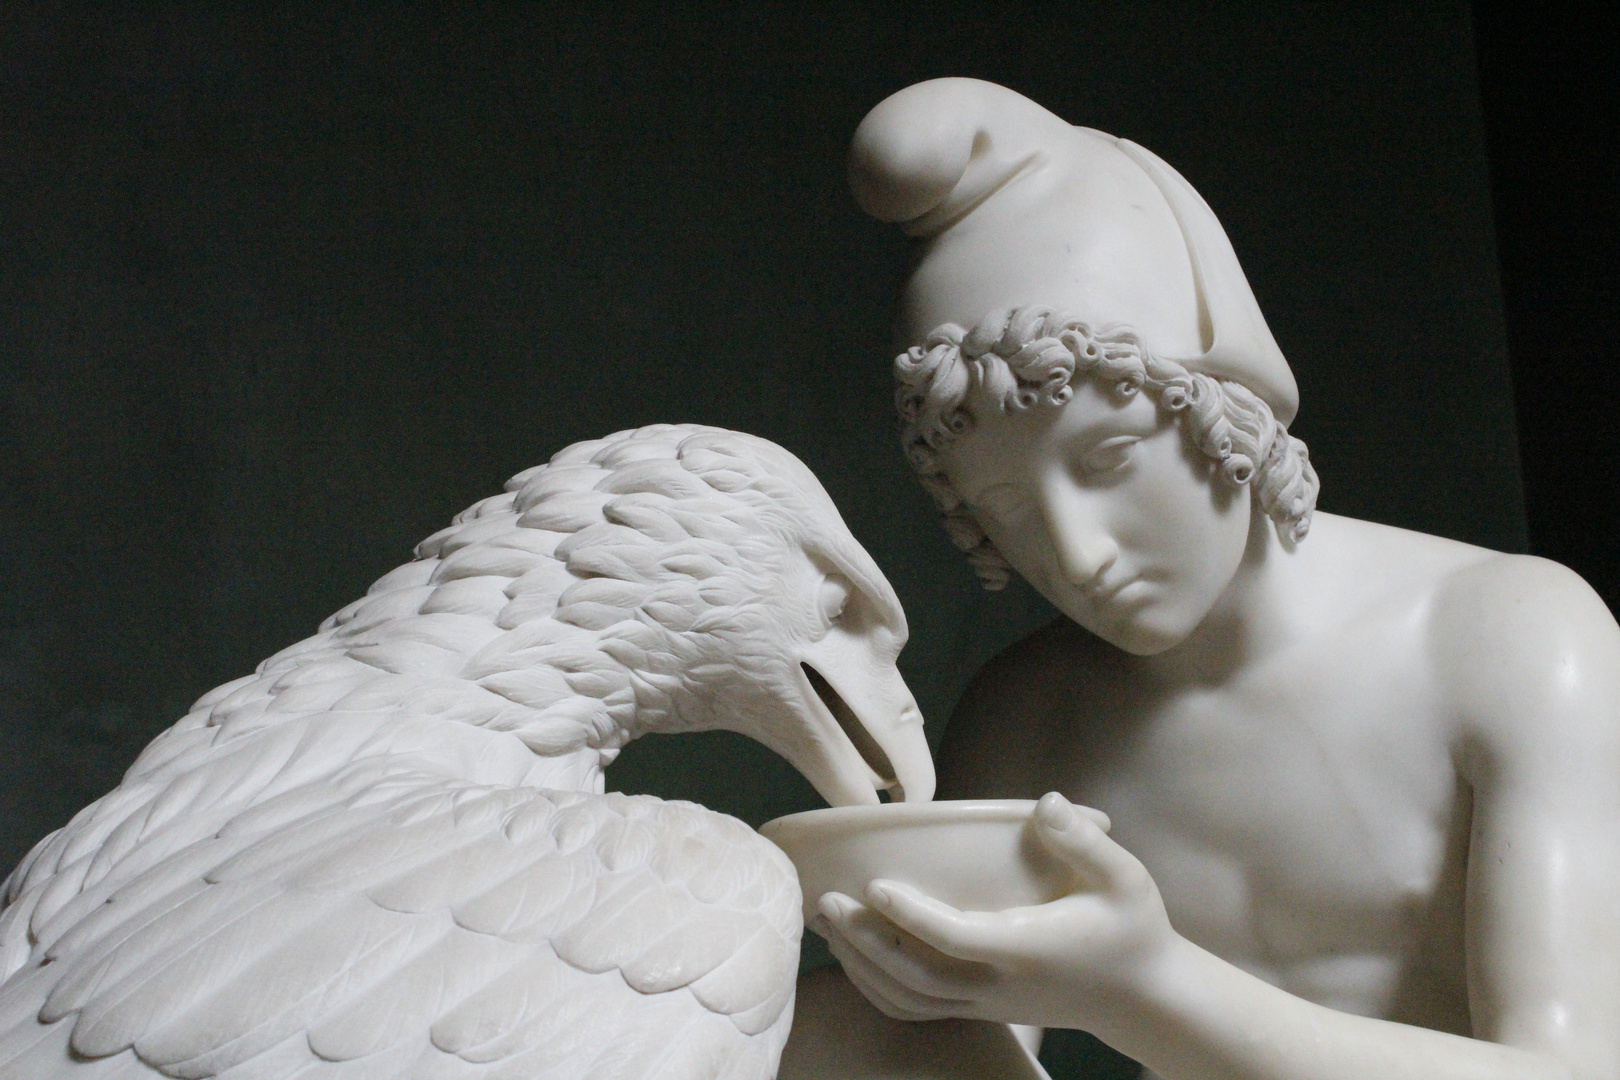 Thorvaldsennuseum Junge mit Adler